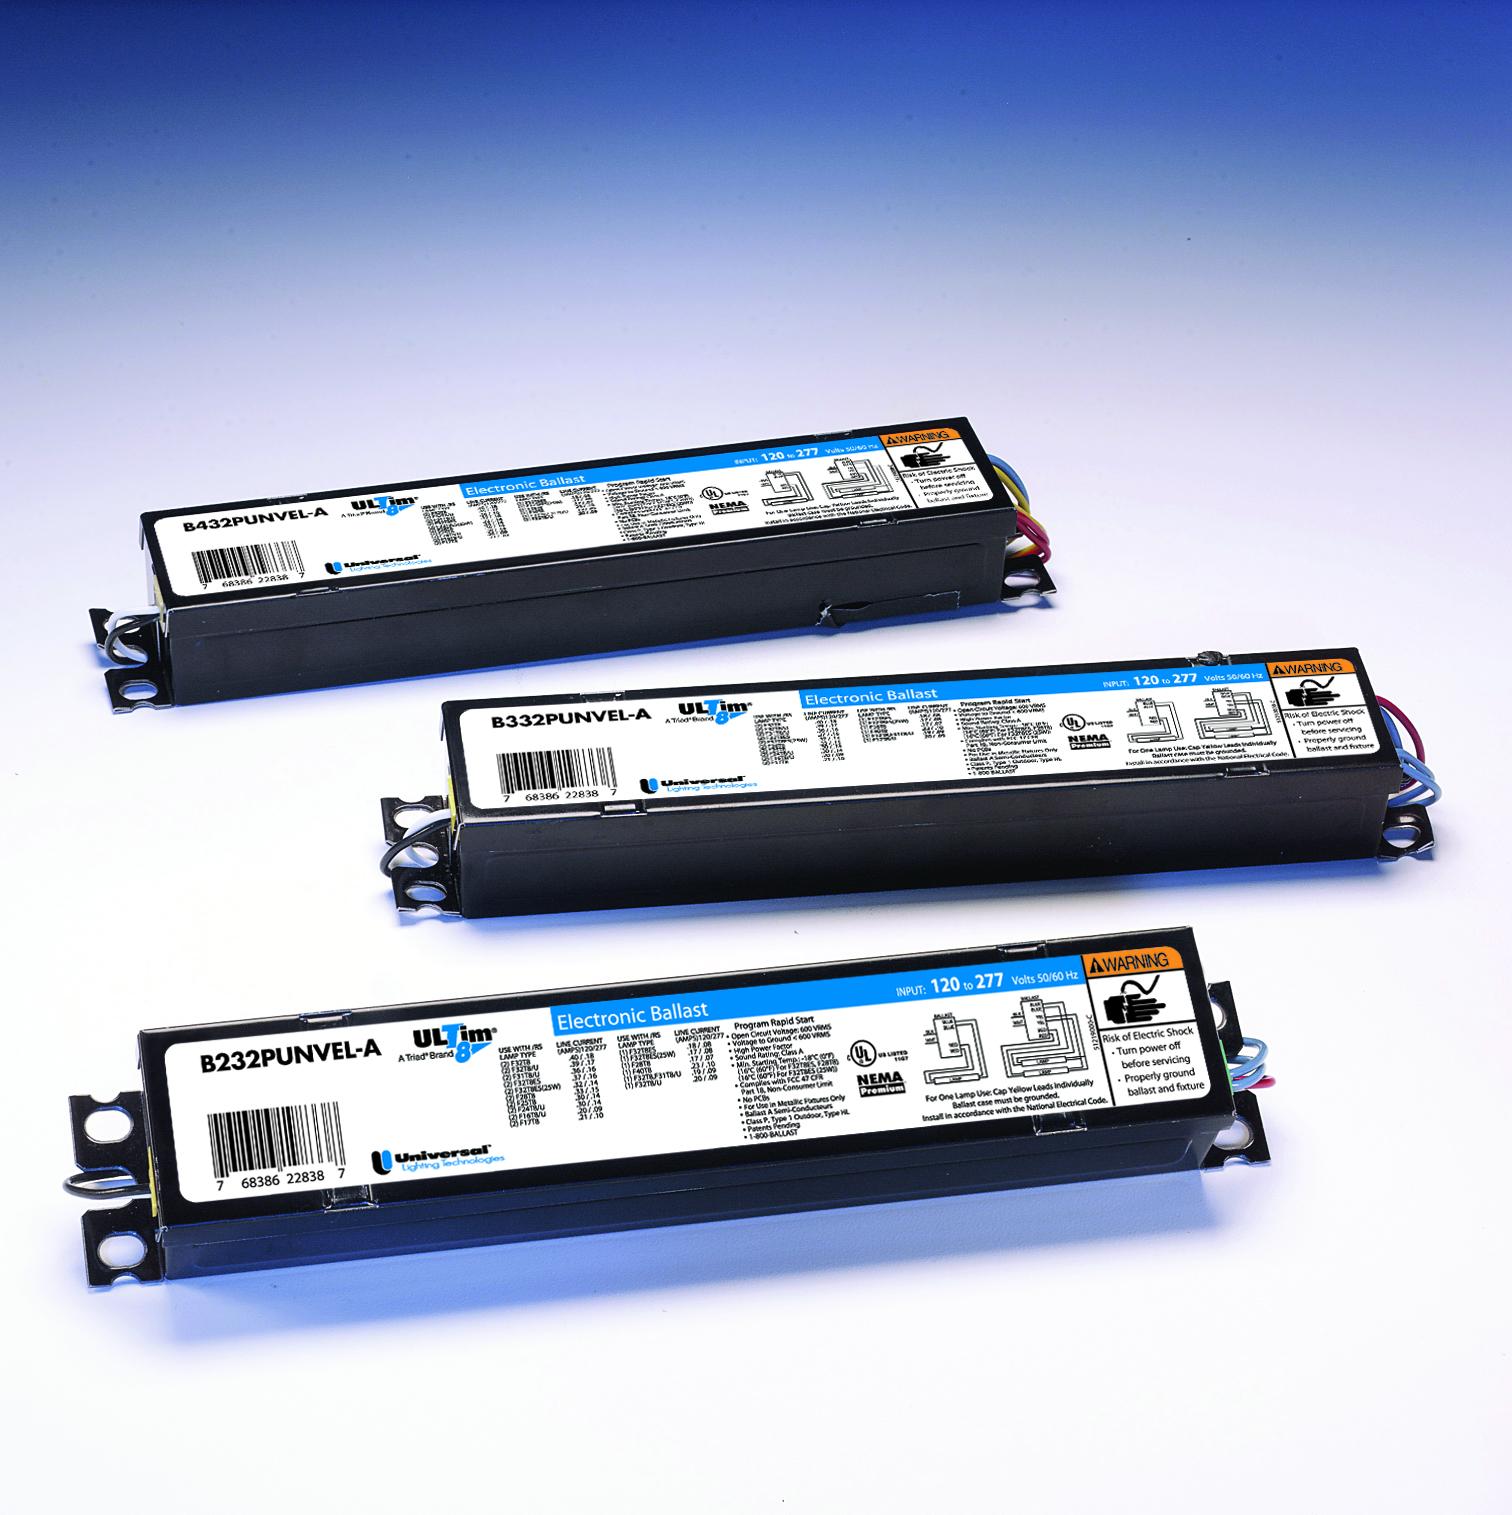 Universal Lighting Technologies B332PUNVHE-A000I UNIVERSAL LIGHTING TECH B332PUNVHEA000I